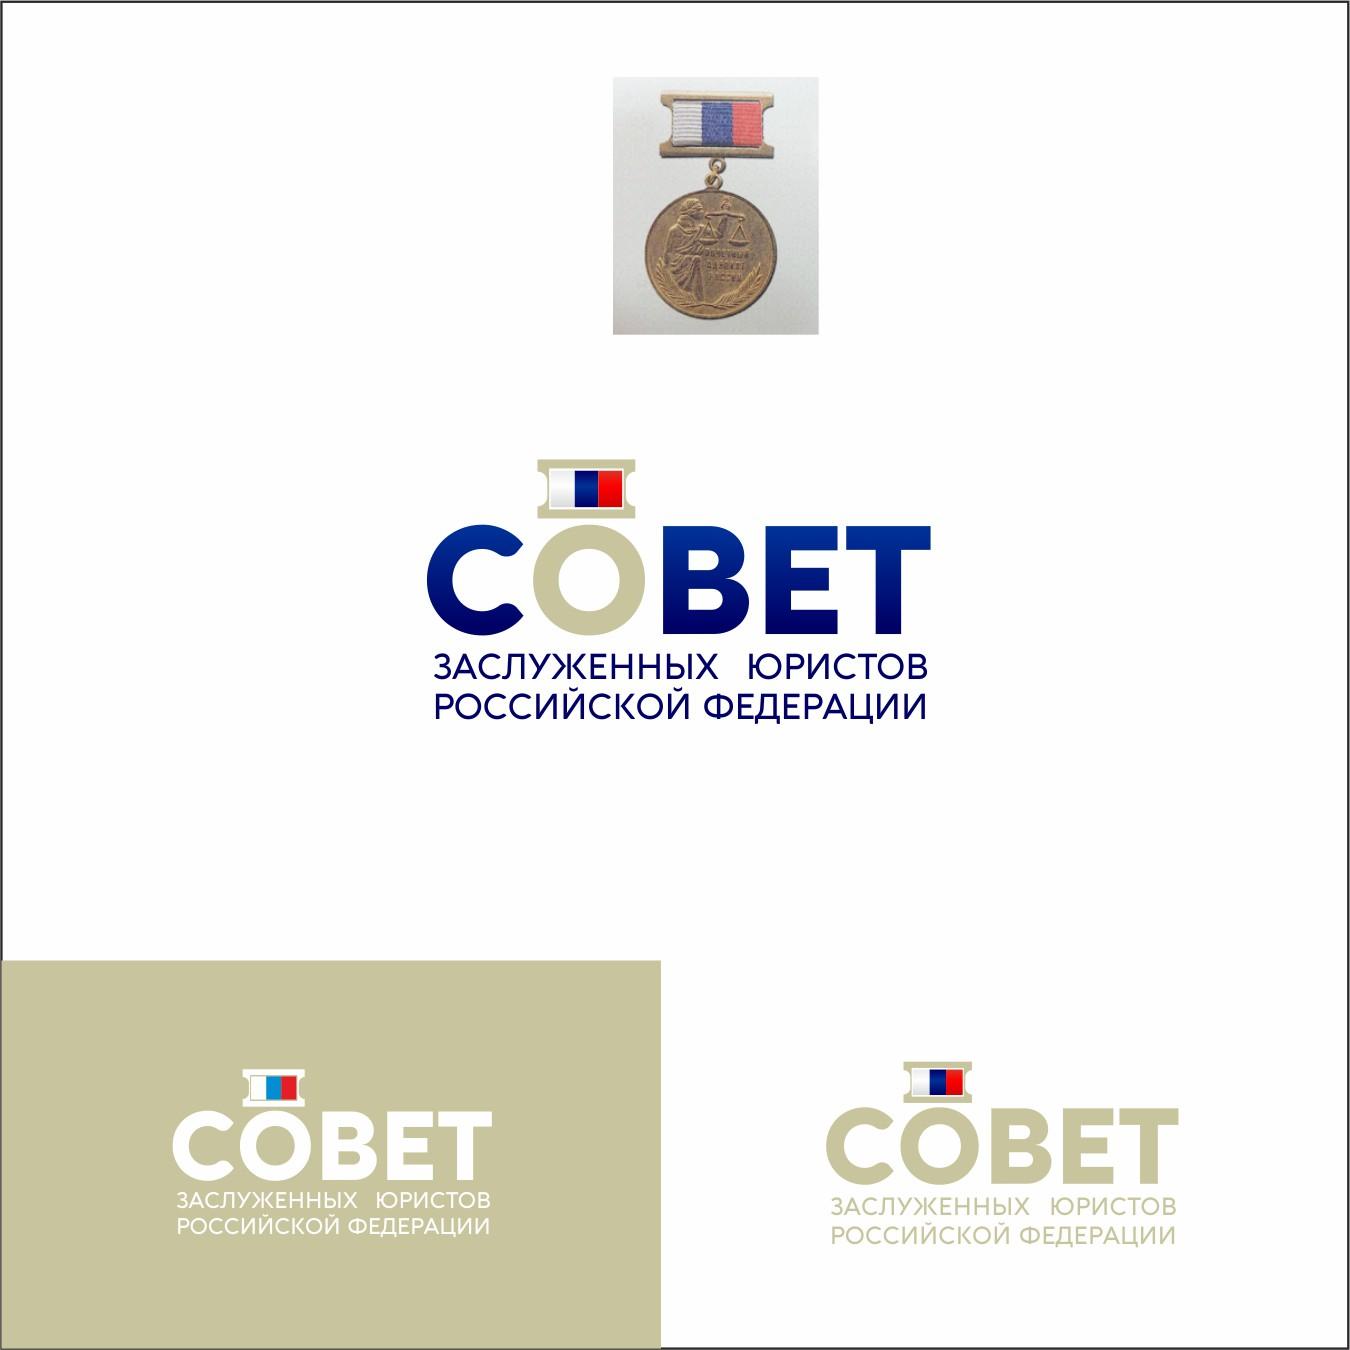 Разработка логотипа Совета (Клуба) заслуженных юристов Российской Федерации фото f_6595e3d710d2022f.jpg